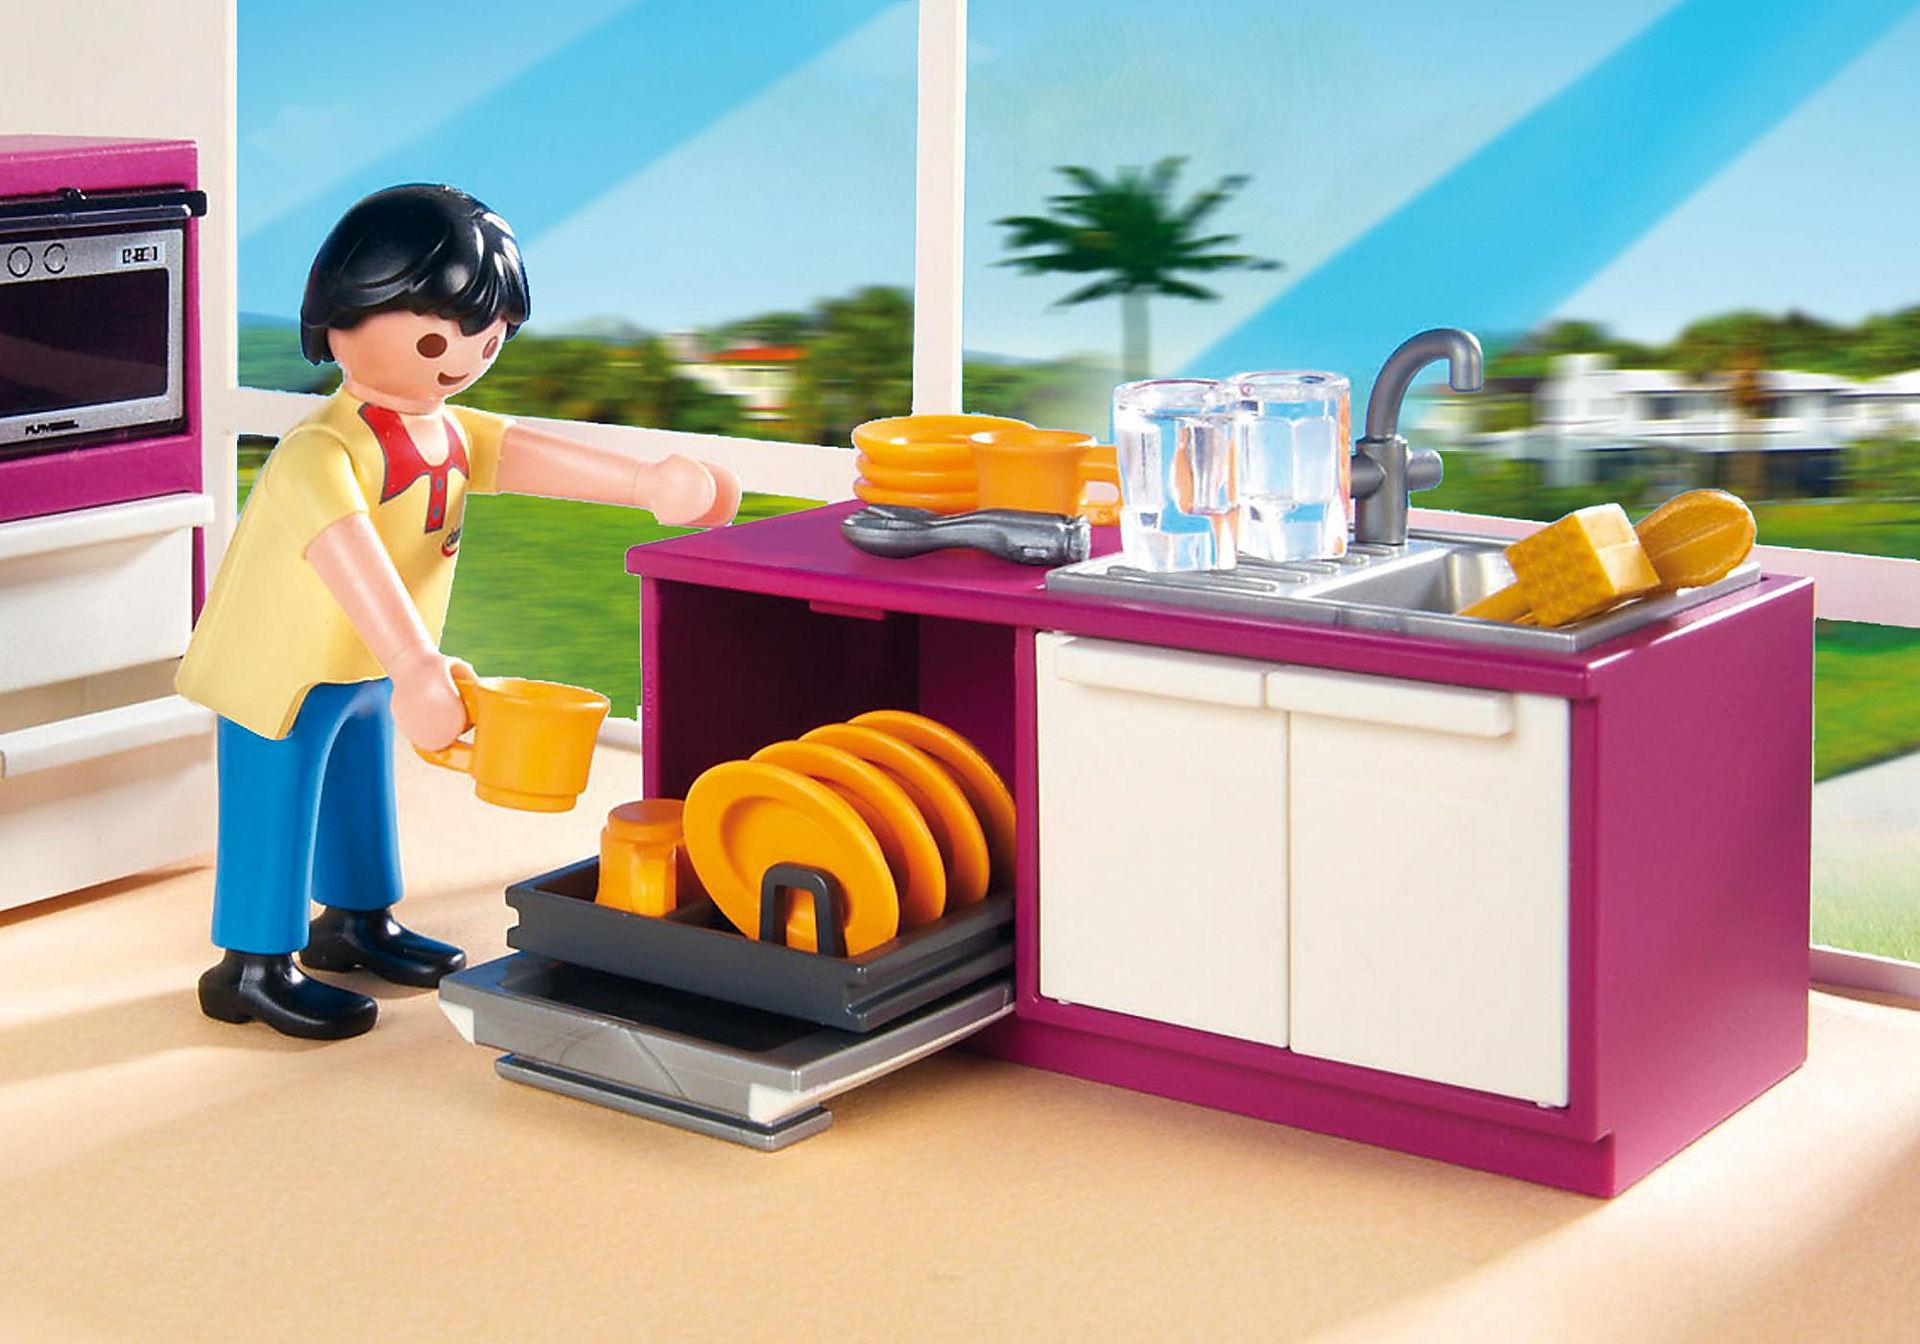 http://media.playmobil.com/i/playmobil/5582_product_extra2/Designerküche